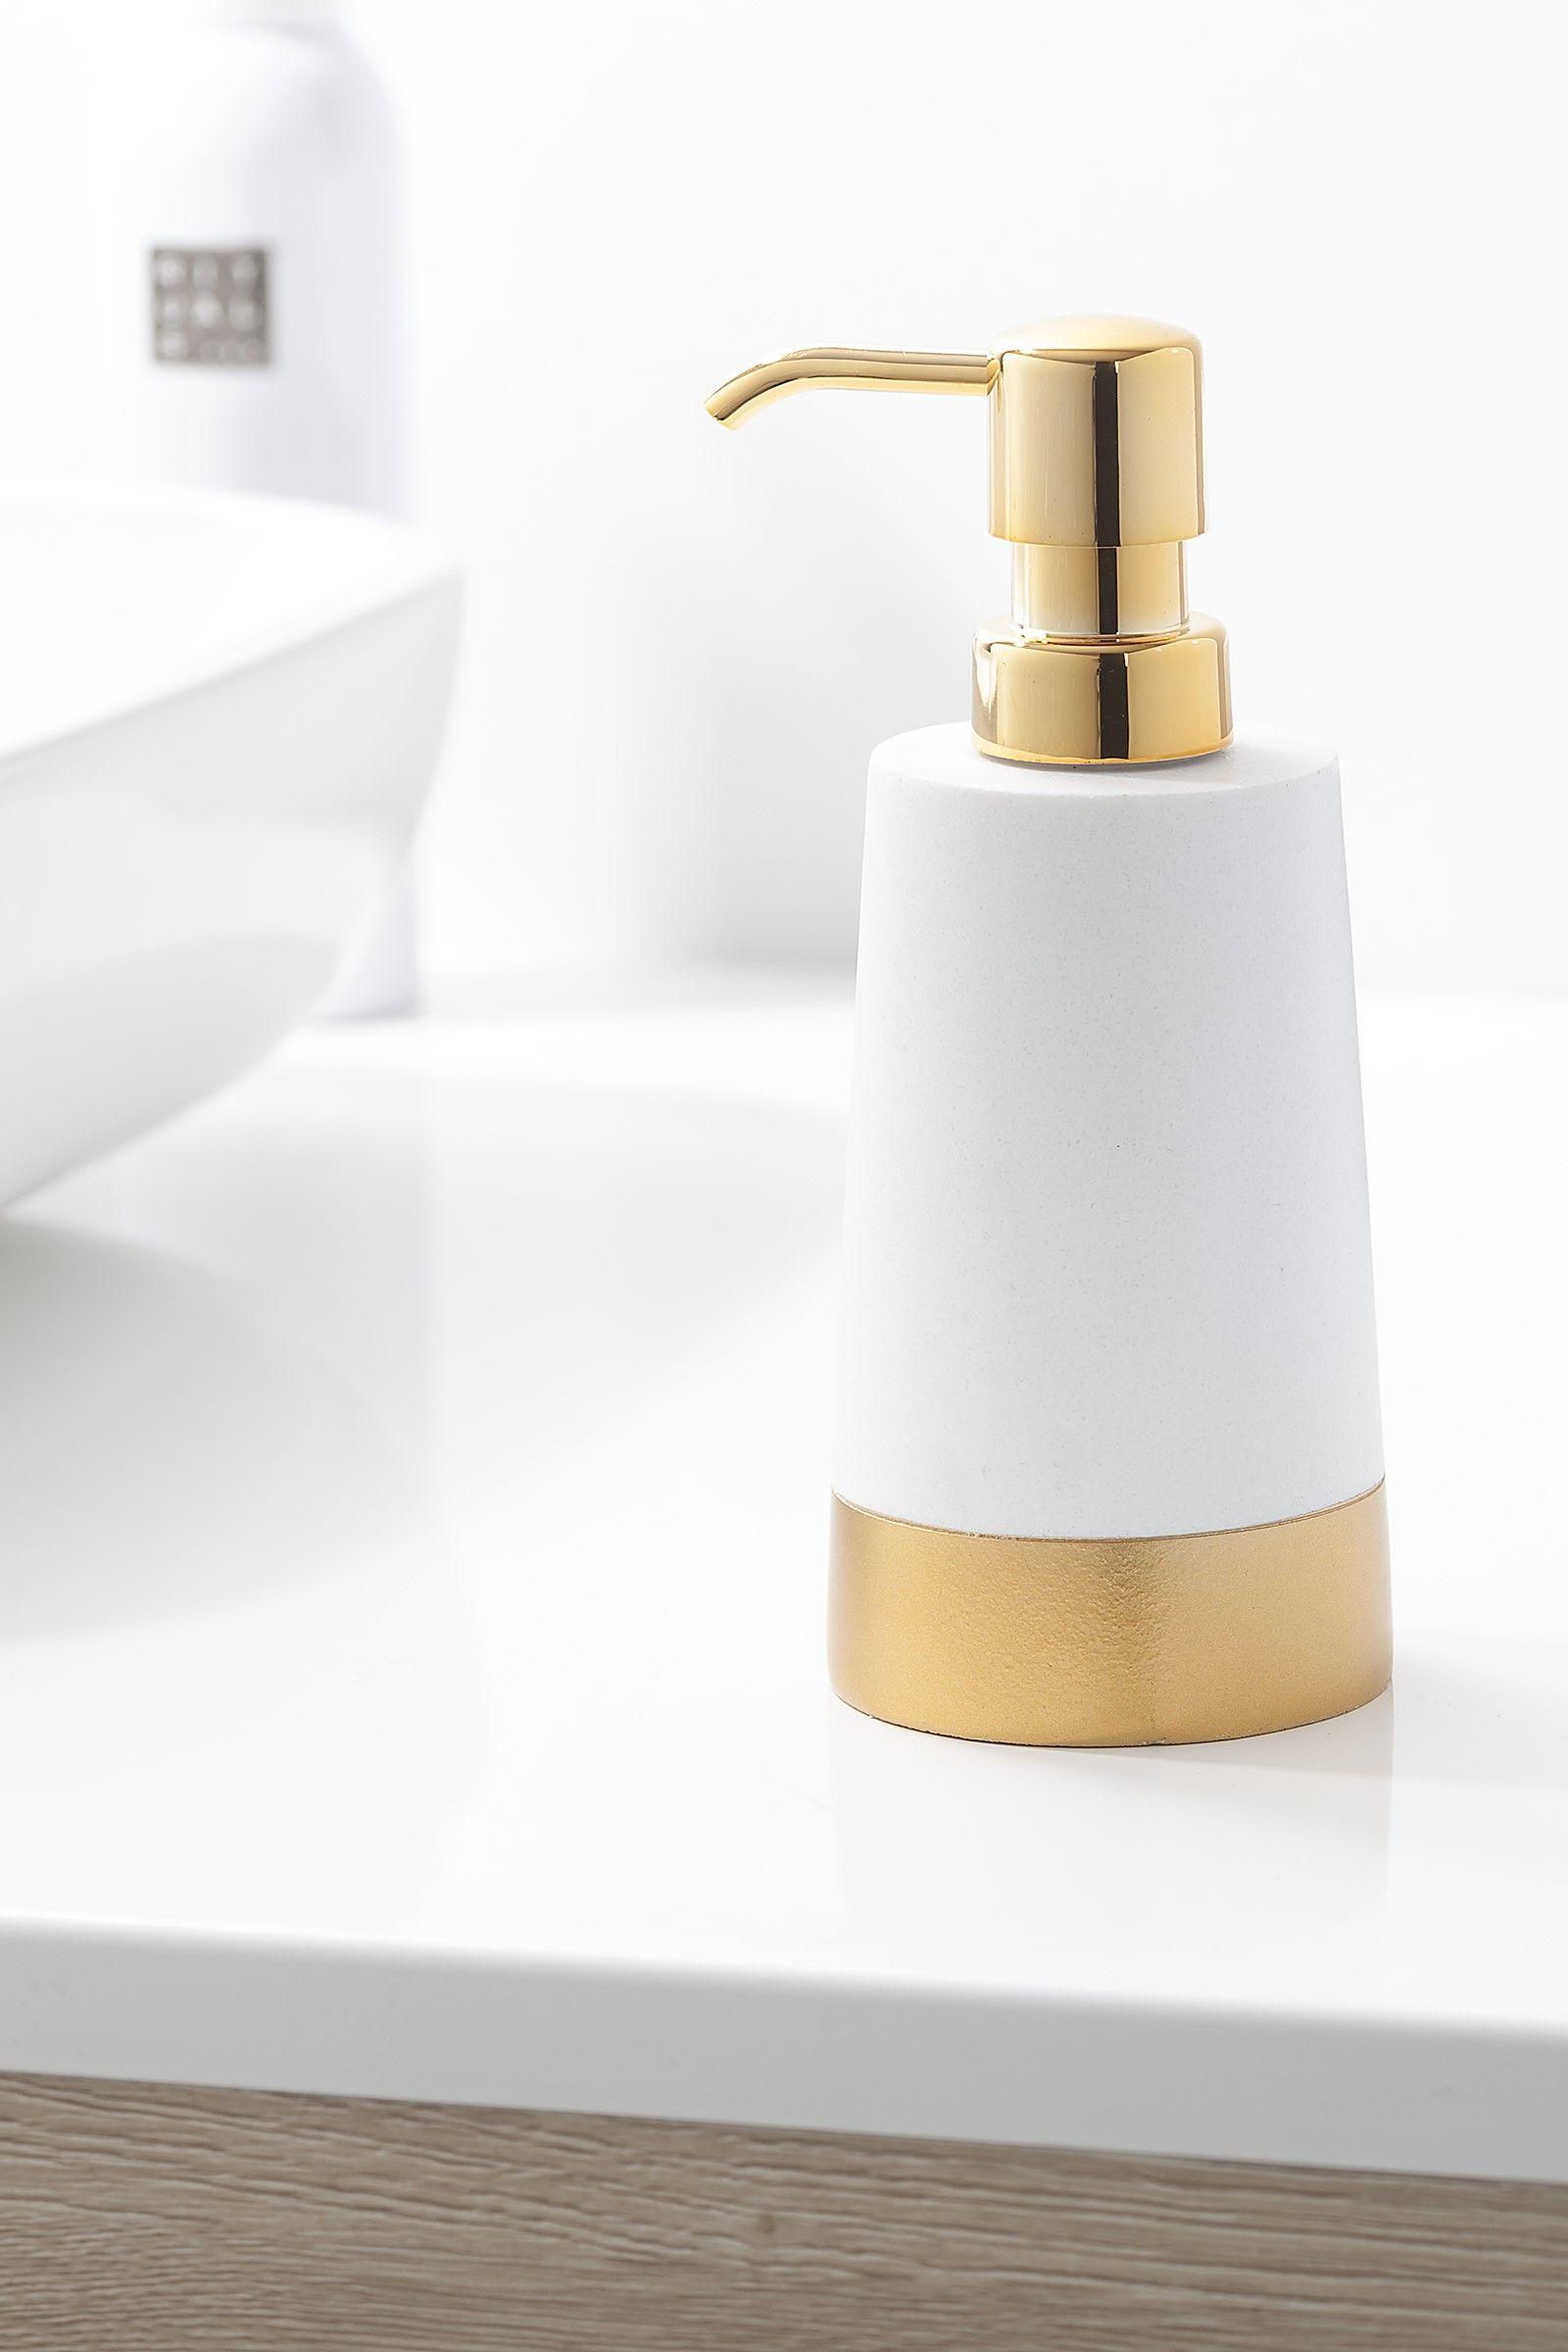 Badezimmer design weiß seifenspender glossy  gold bathroom washroom and budgeting